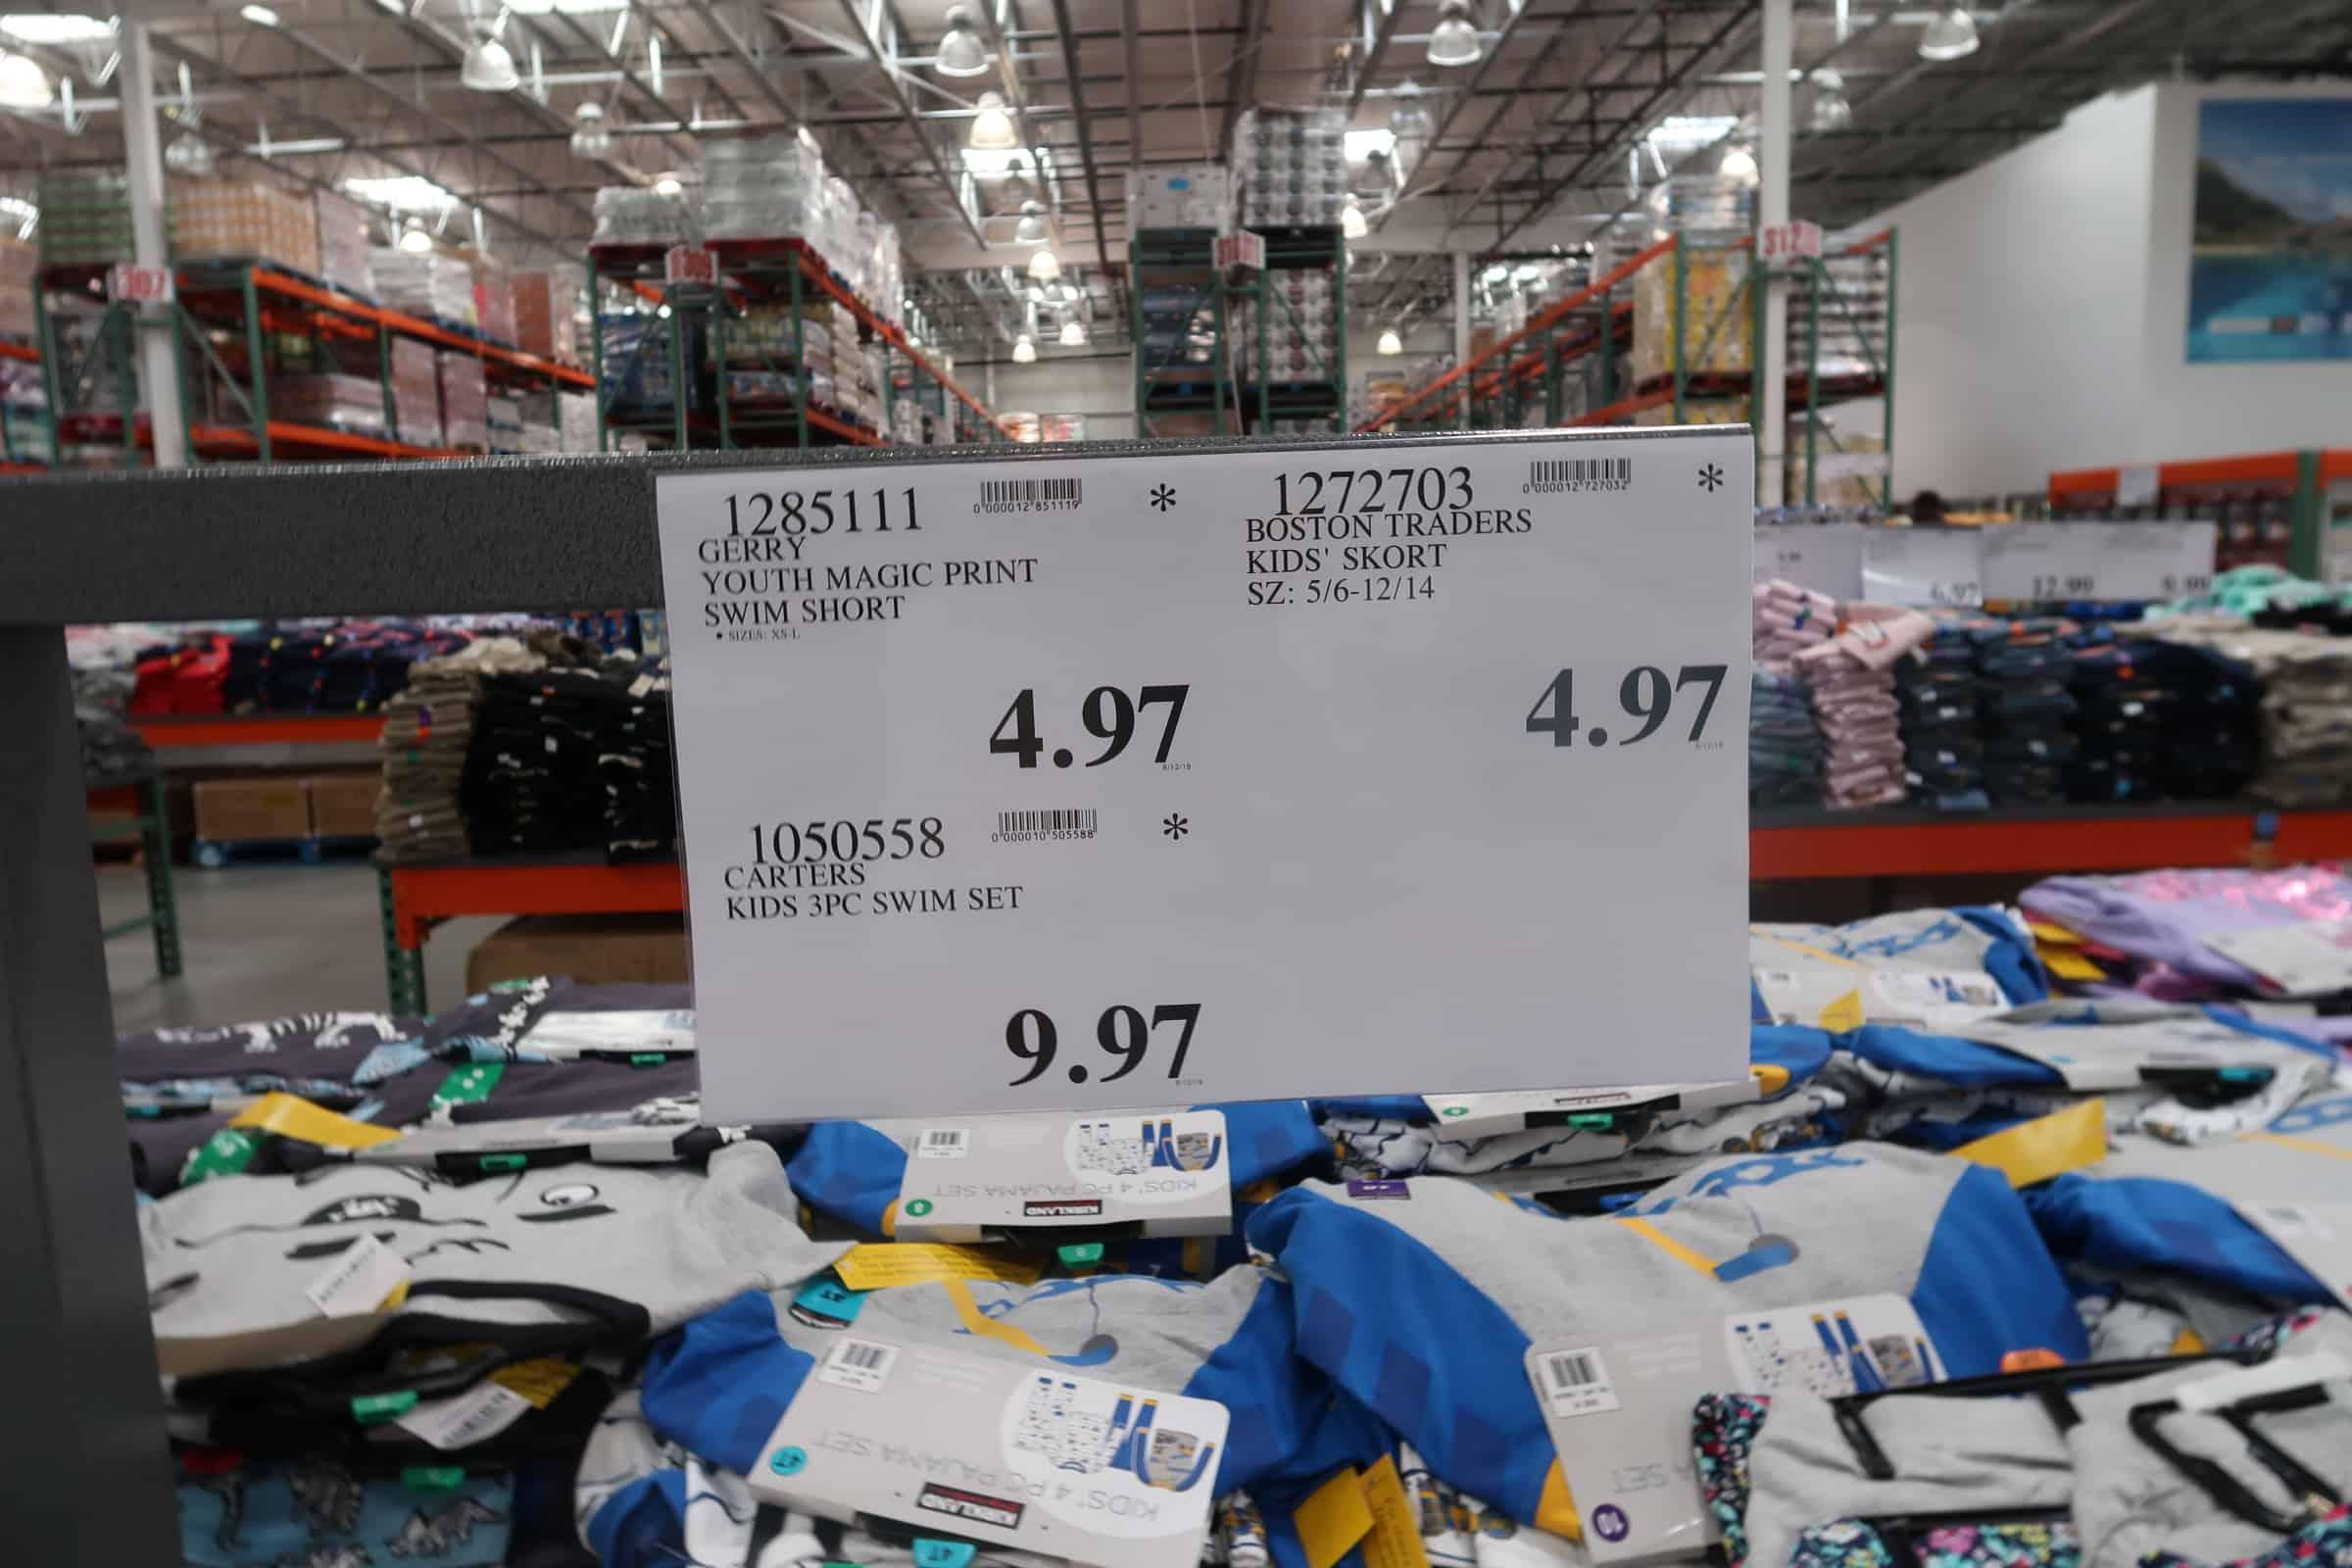 carters clothes deal at costco